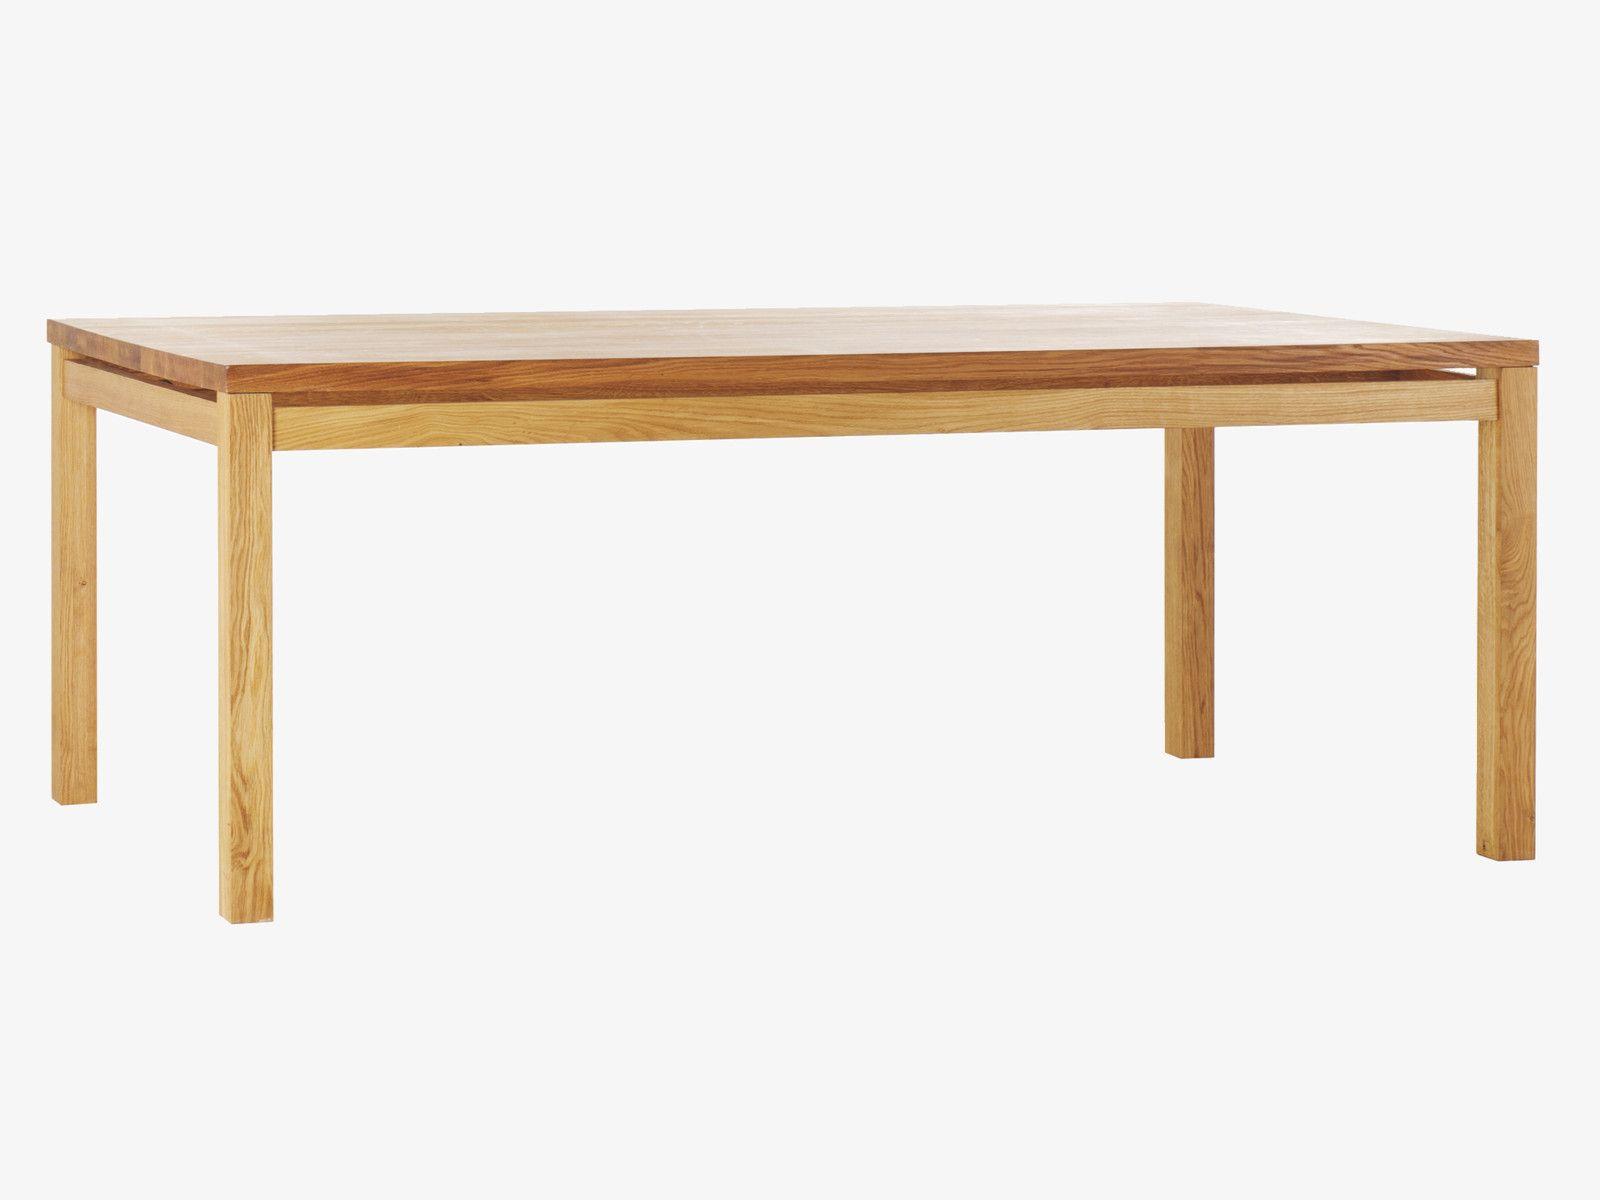 219e3146094e Ebbe Gehl for John Lewis Mira 3-Seater Dining Bench, Oak at John Lewis &  Partners